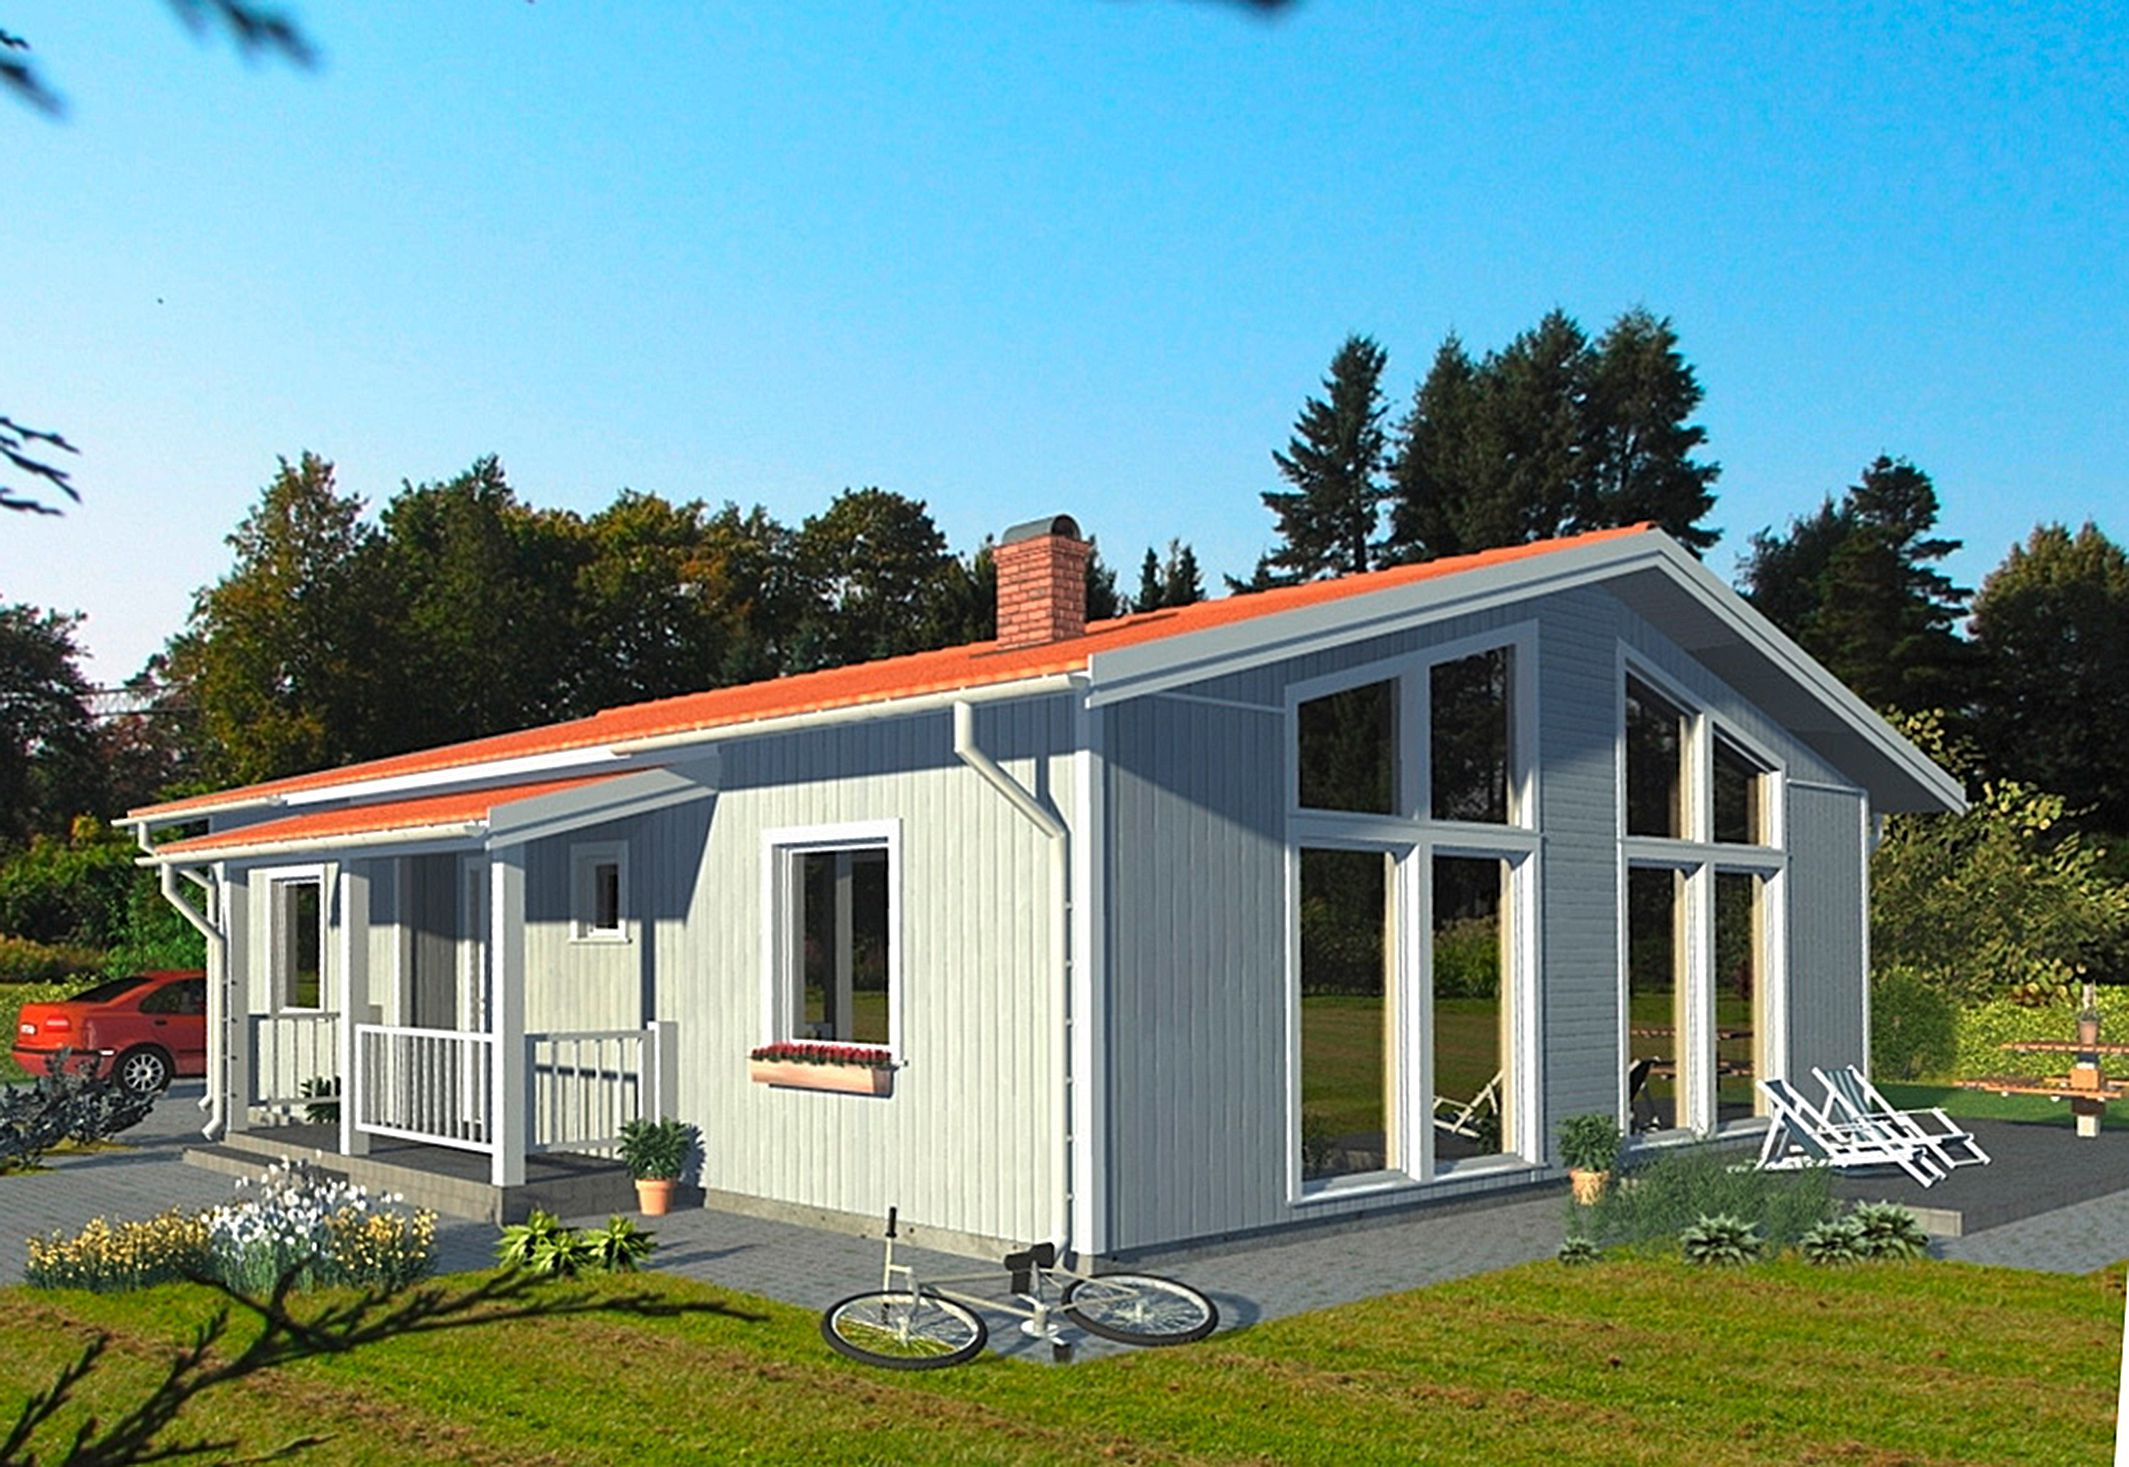 Fertighaus aus Holz bauen, Holzhaus-Bausatz Preise size: 2129 x 1467 post ID: 5 File size: 0 B